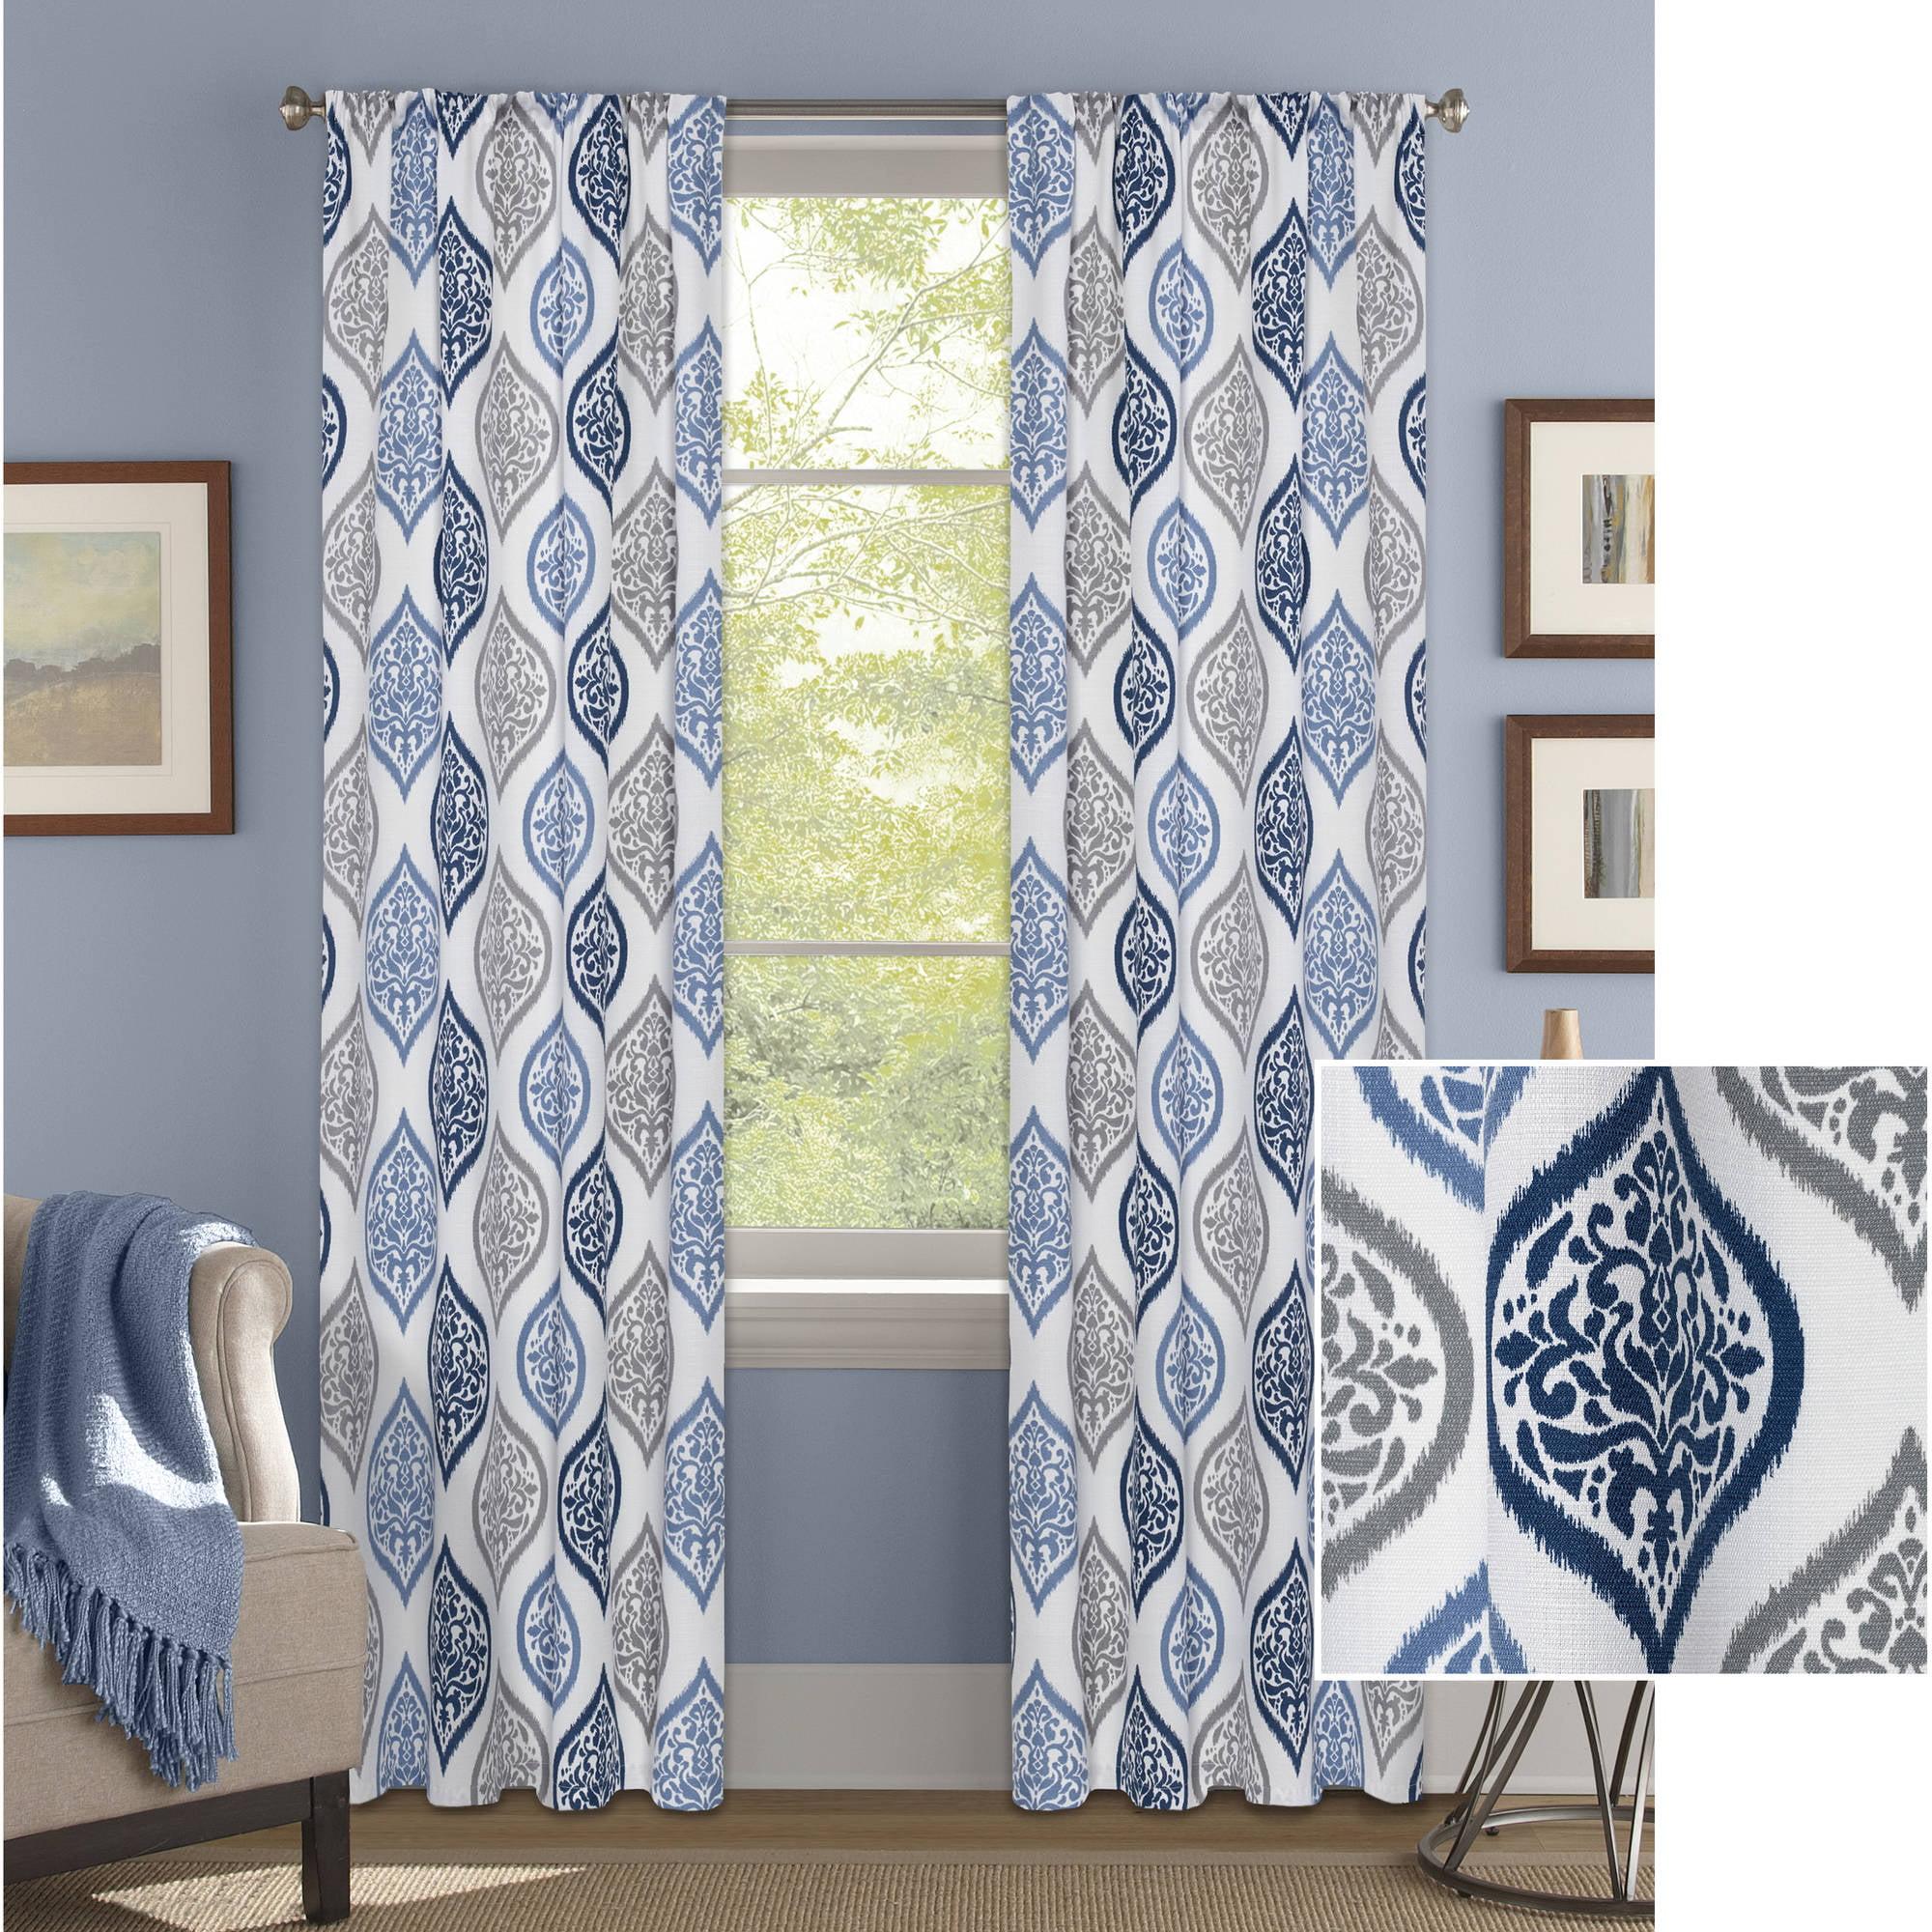 Better Homes & Gardens Damask Ogee Curtain Panel